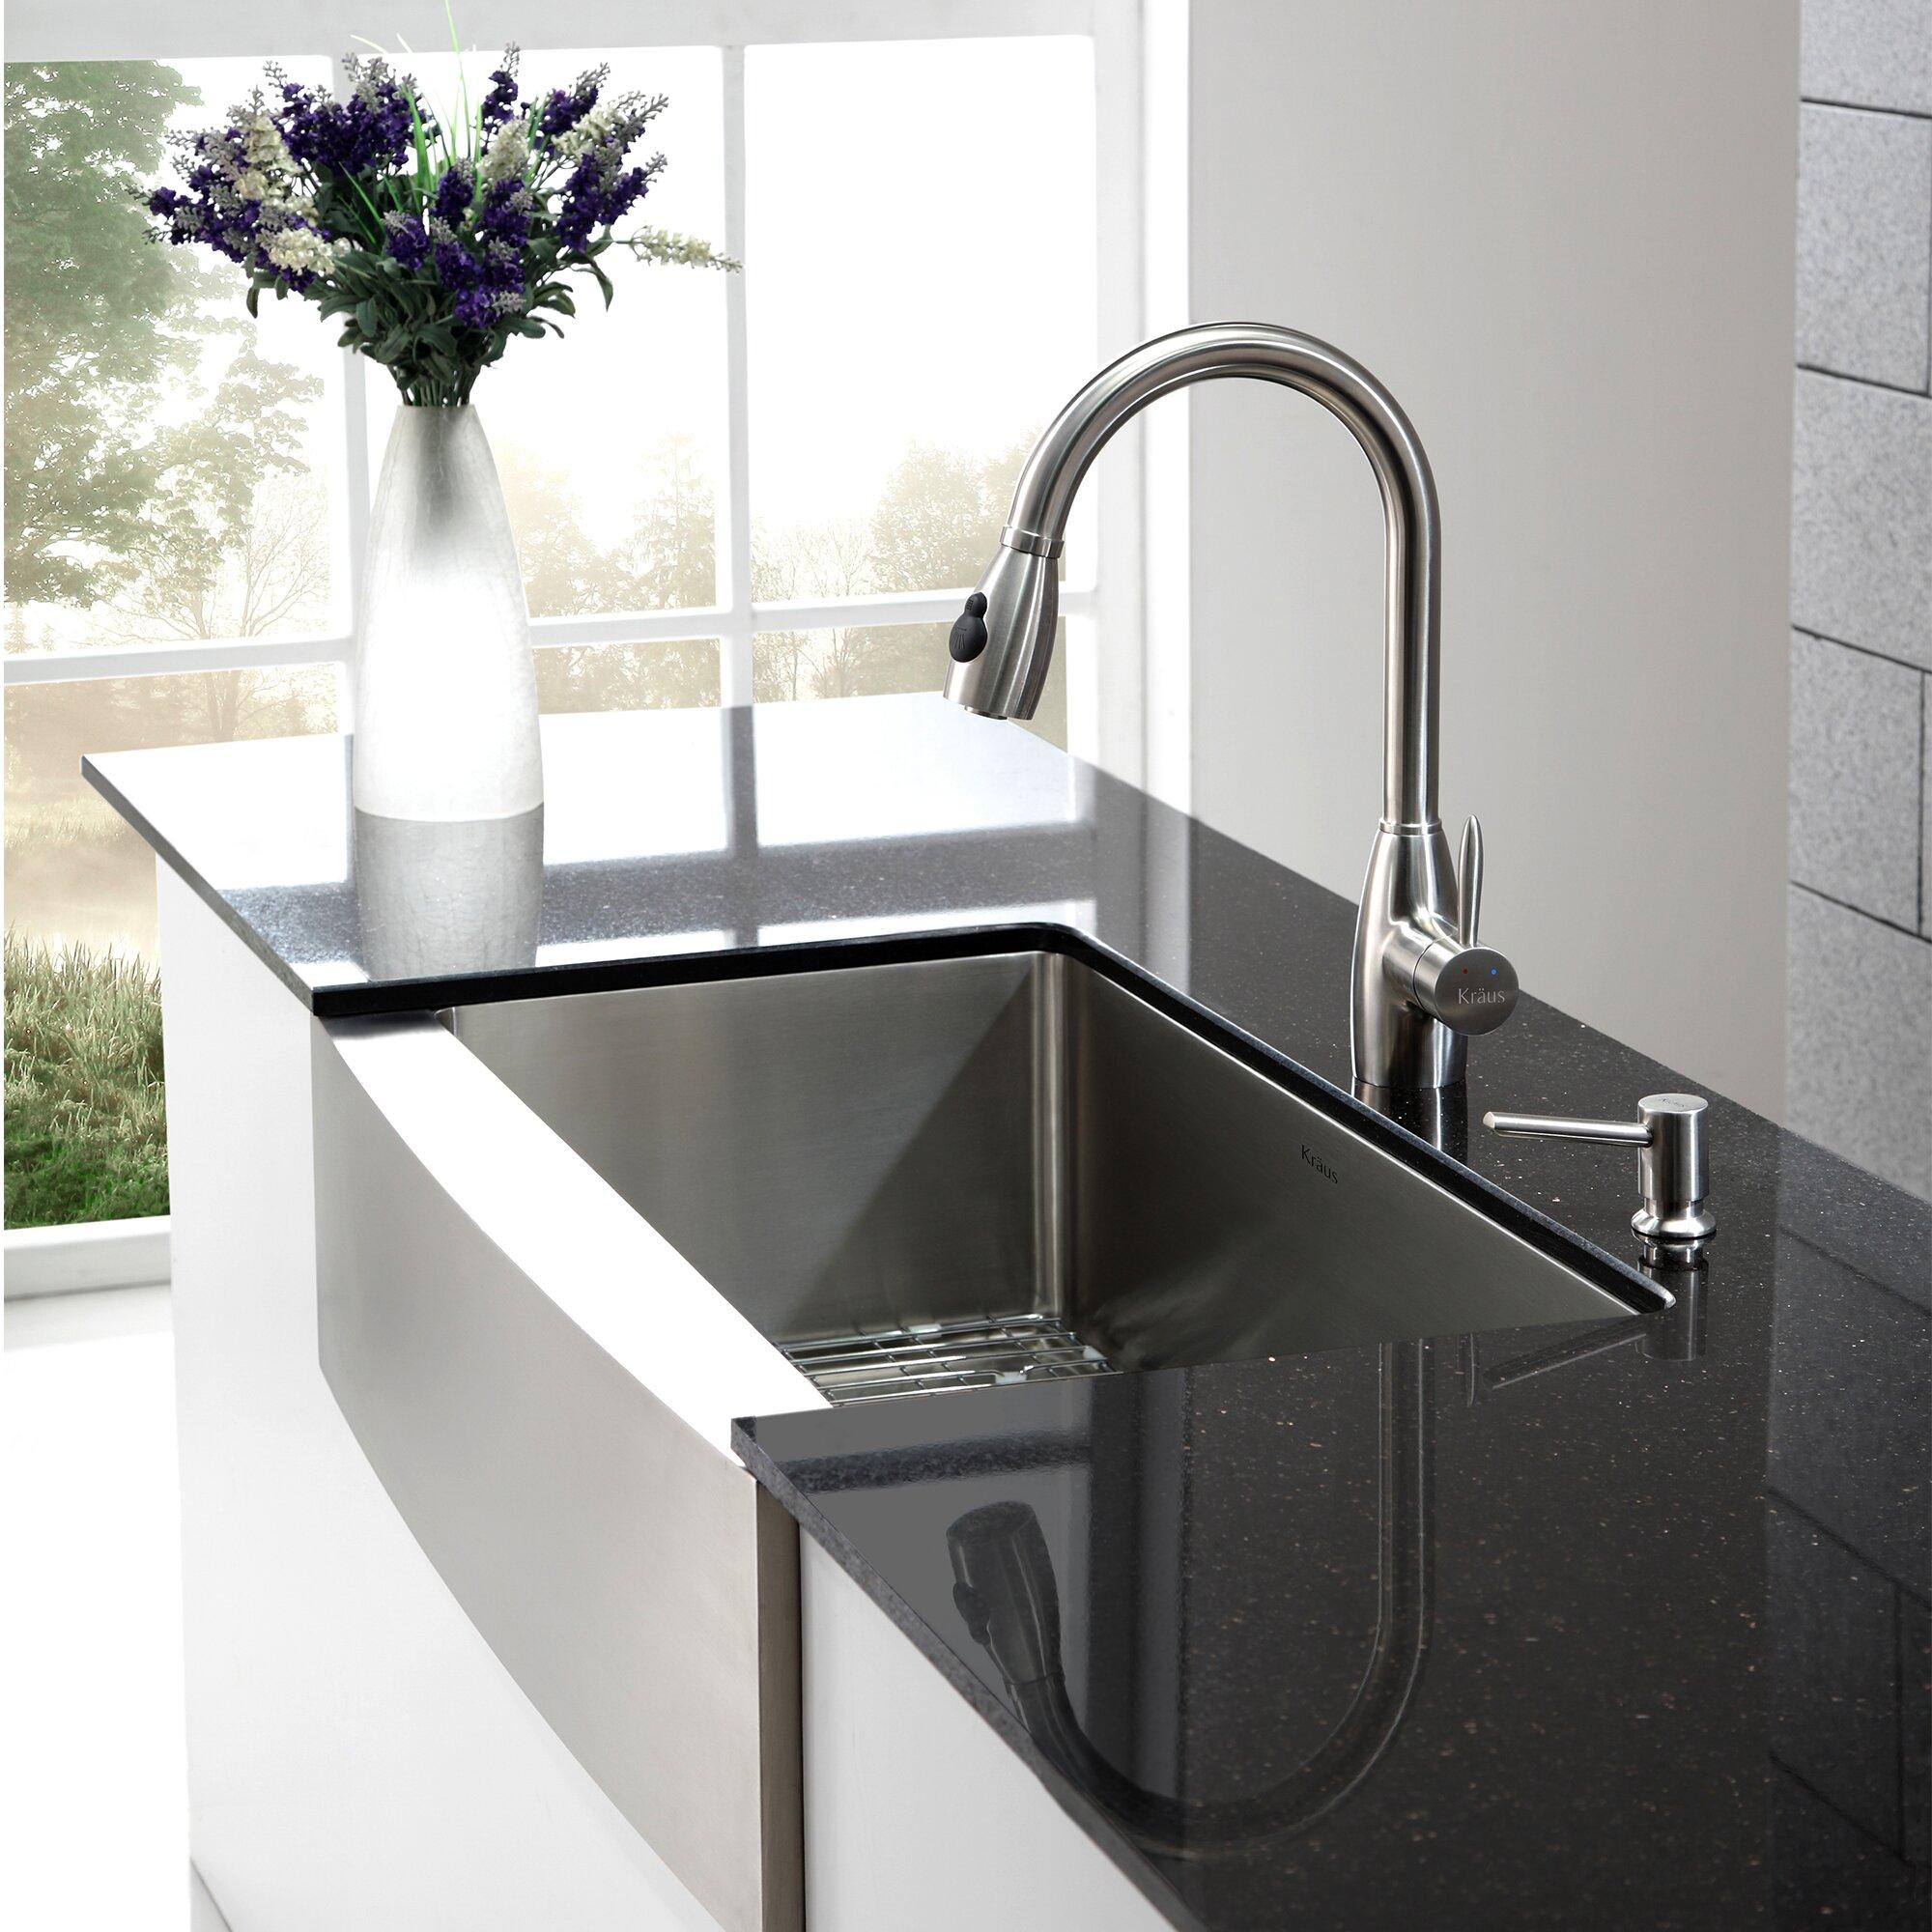 Kraus Kitchen Sink Reviews : Kraus 35.88